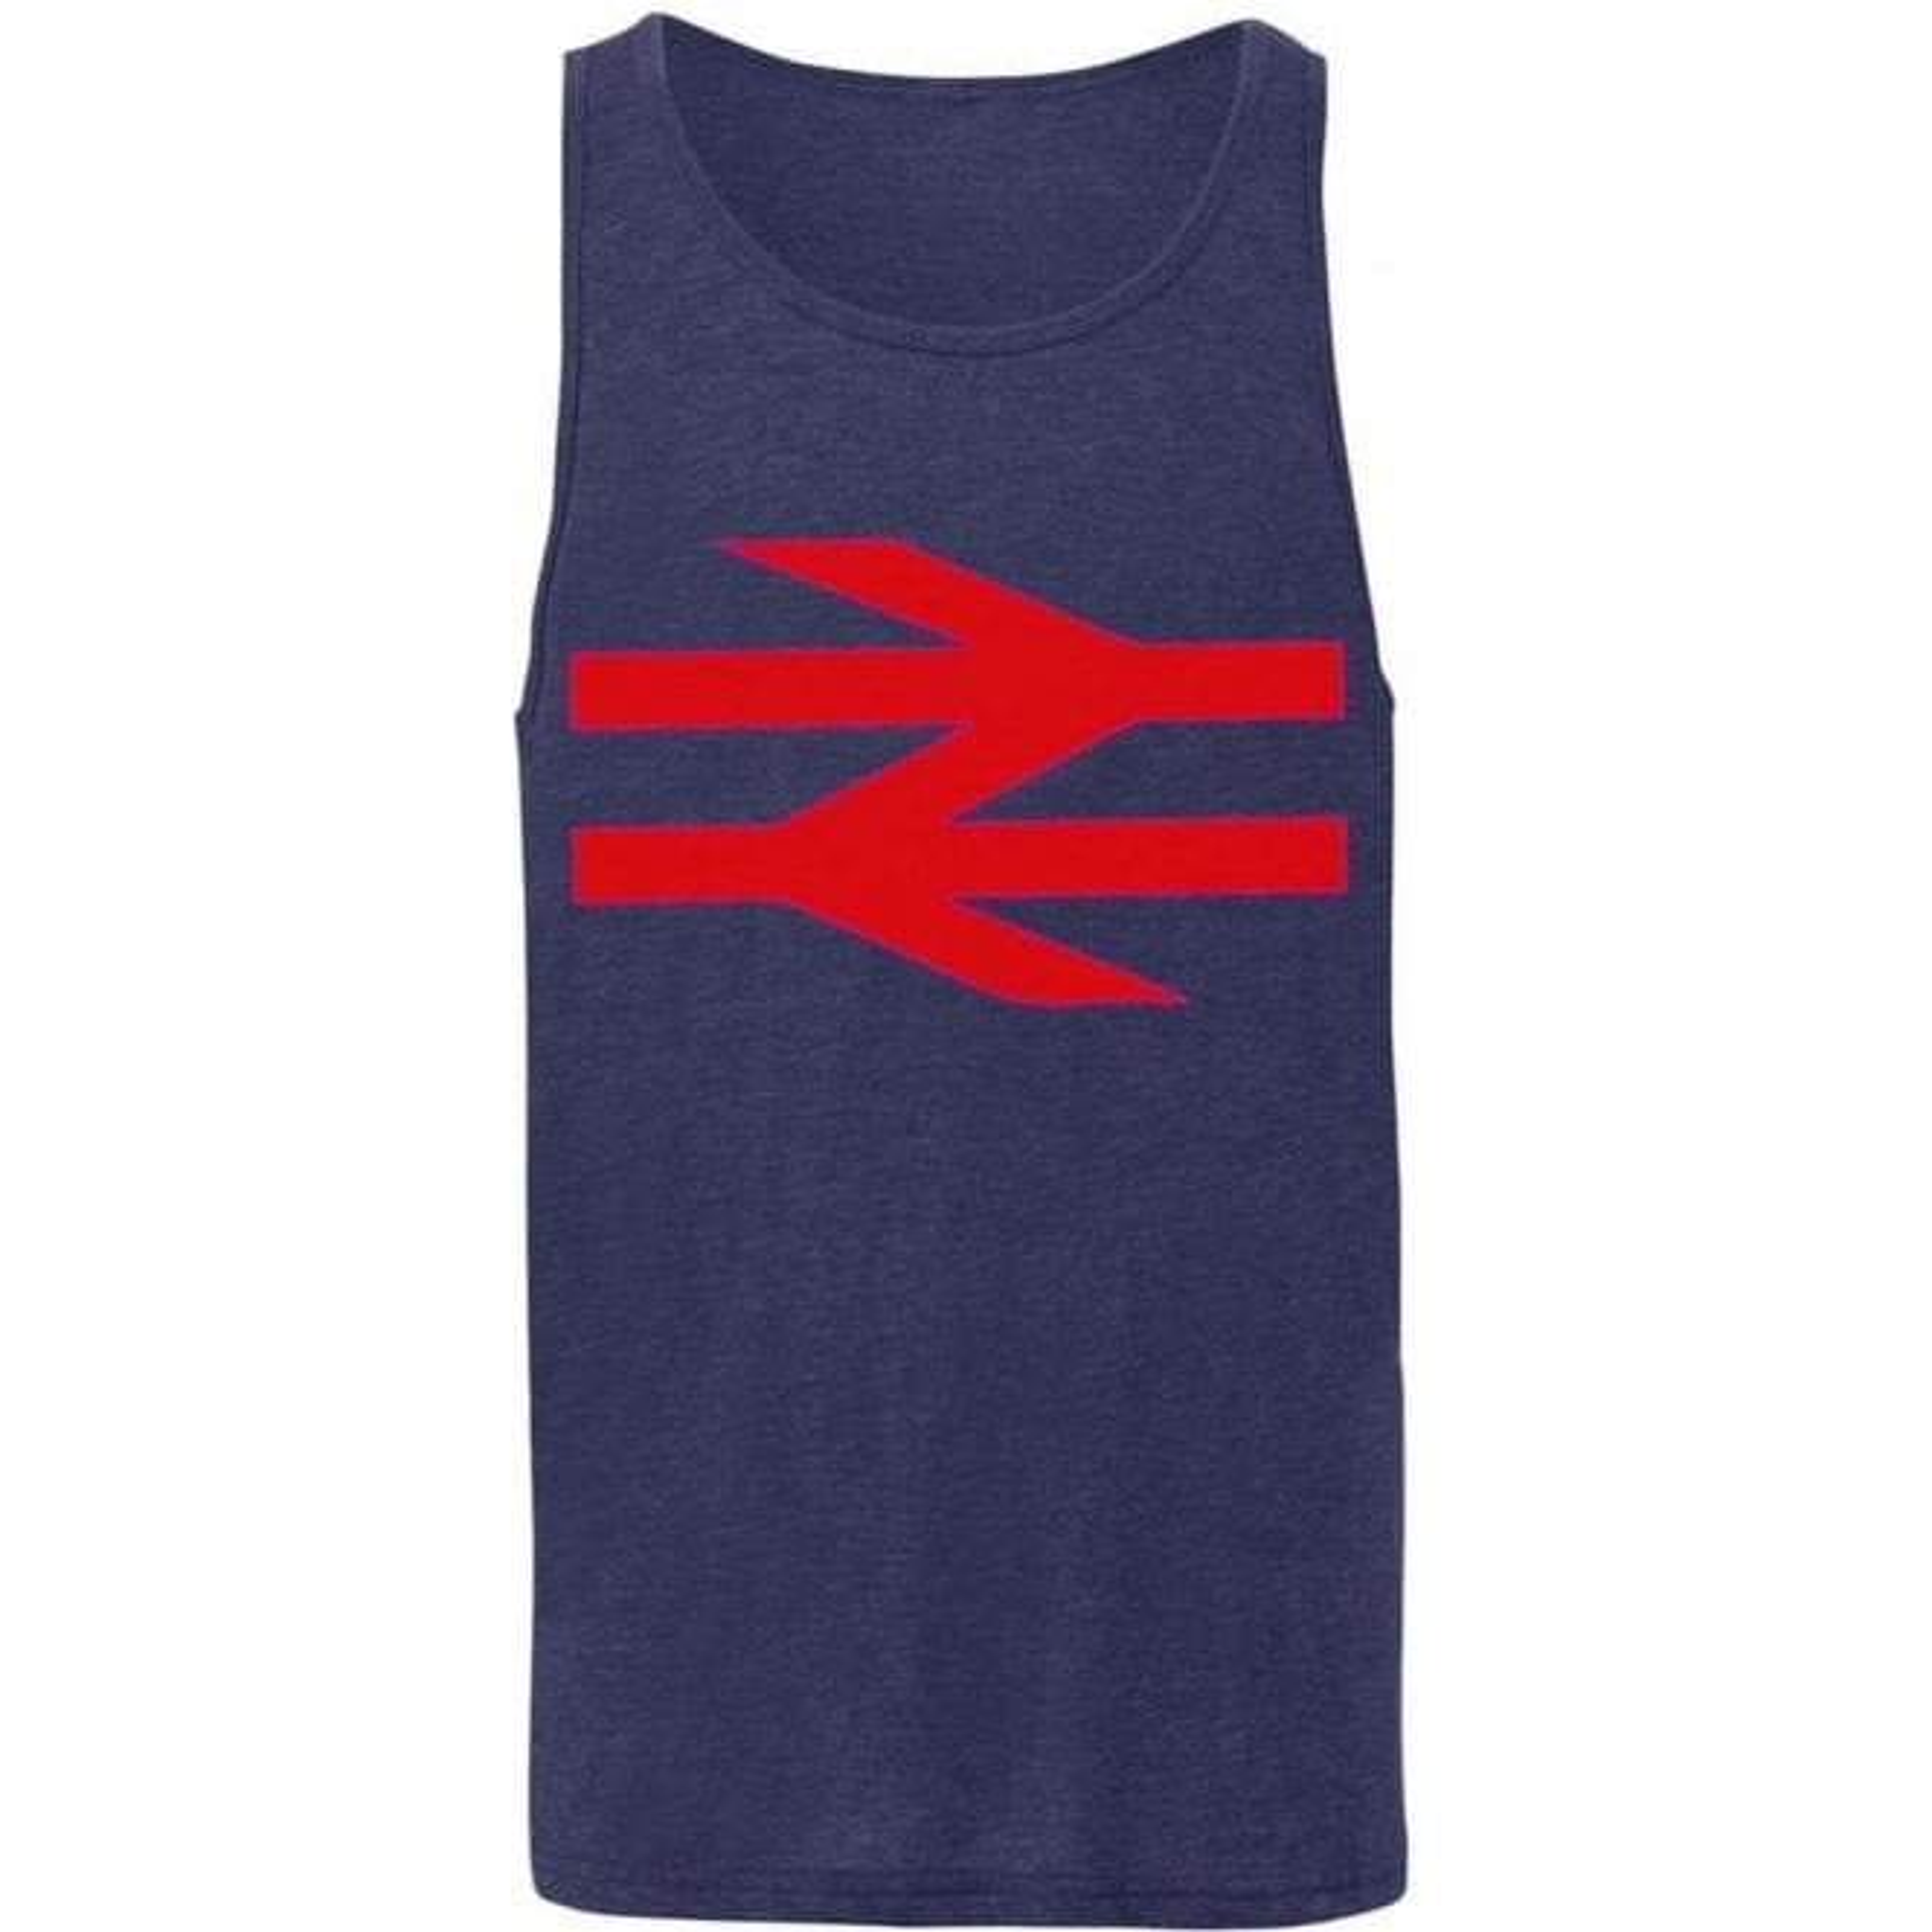 British Rail (As Worn By Damon Albarn, Blur/Gorillaz) Men's Tank Top